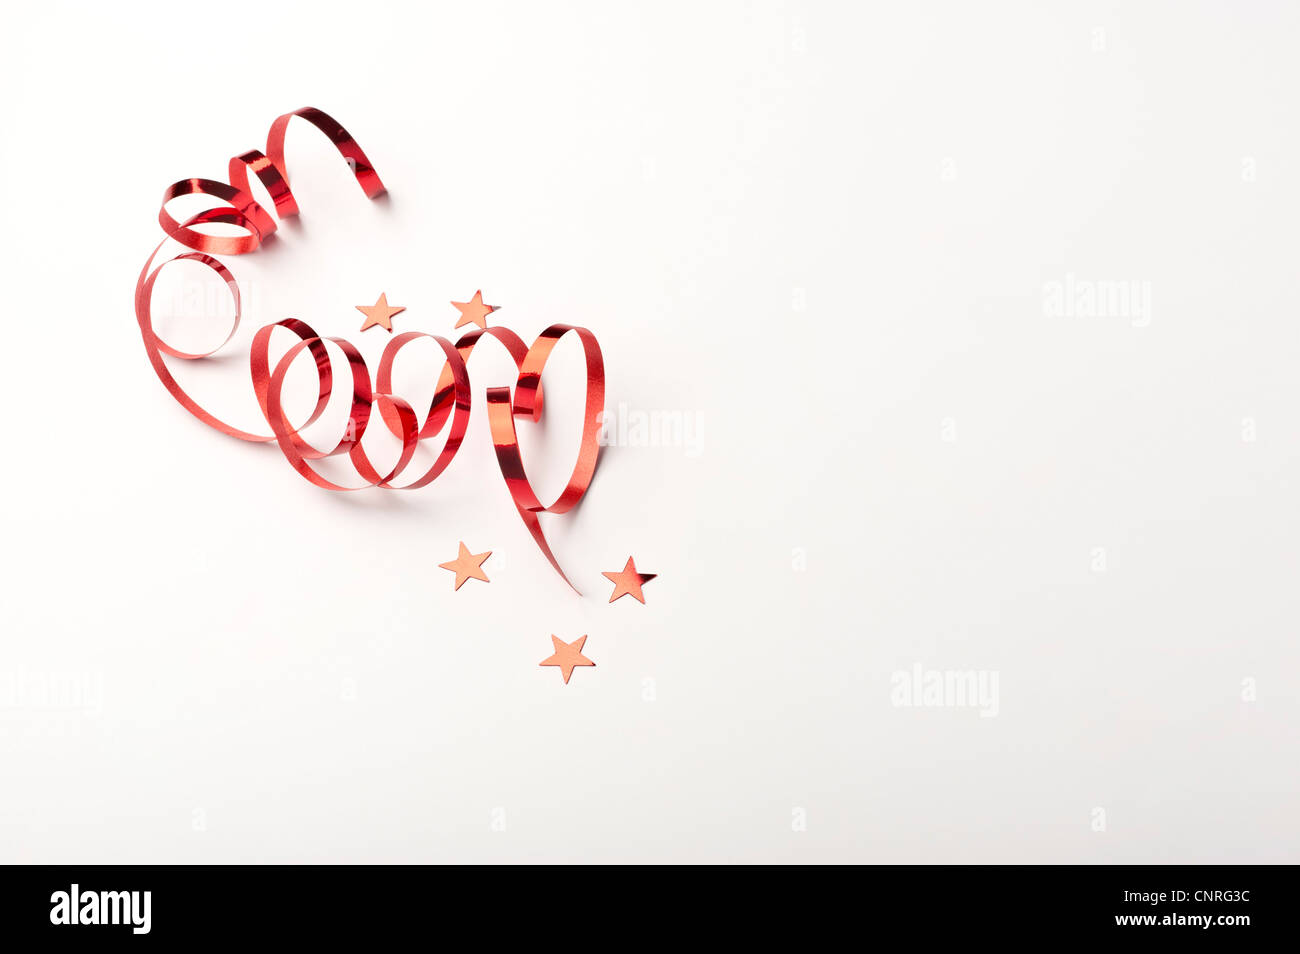 Confetti and gift-wrap ribbon - Stock Image